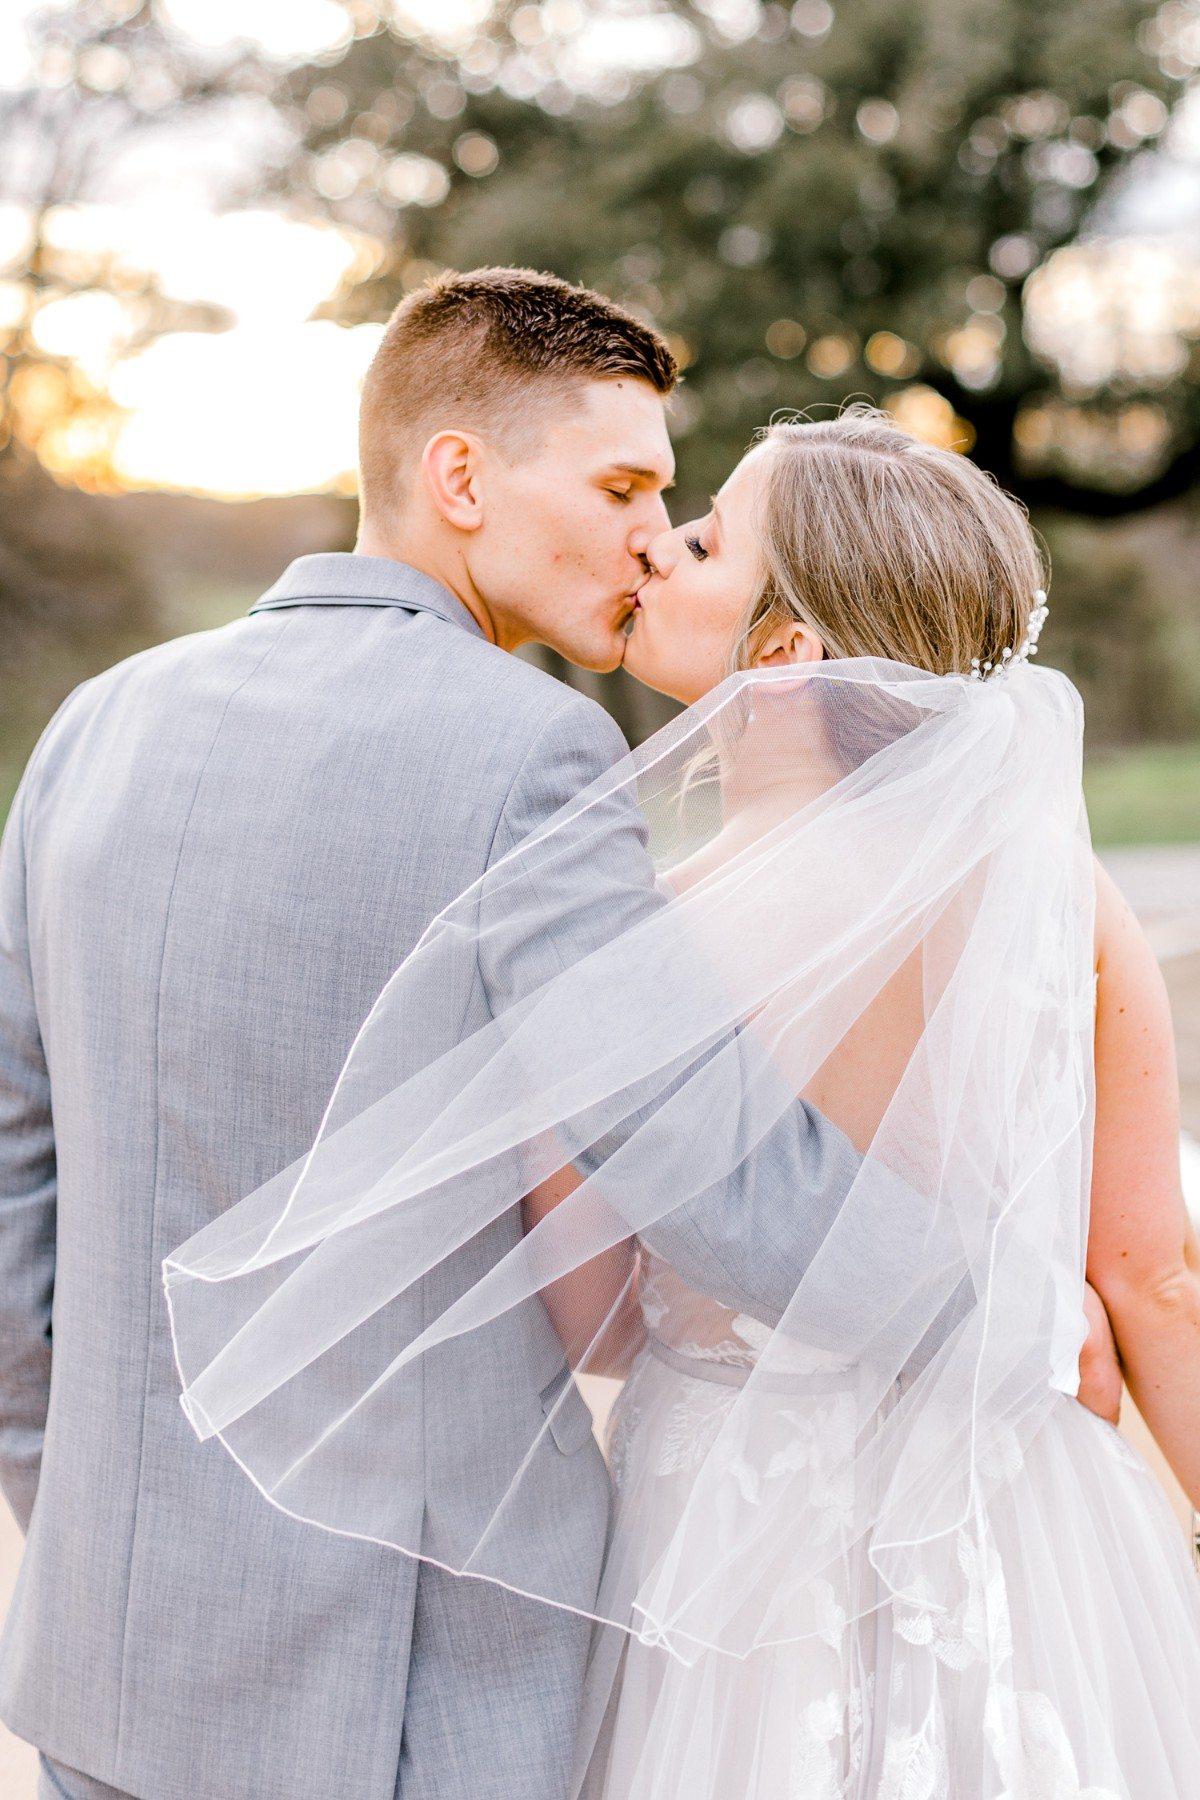 ennis-texas-wedding-photographer-kaitlyn-bullard-106.jpg